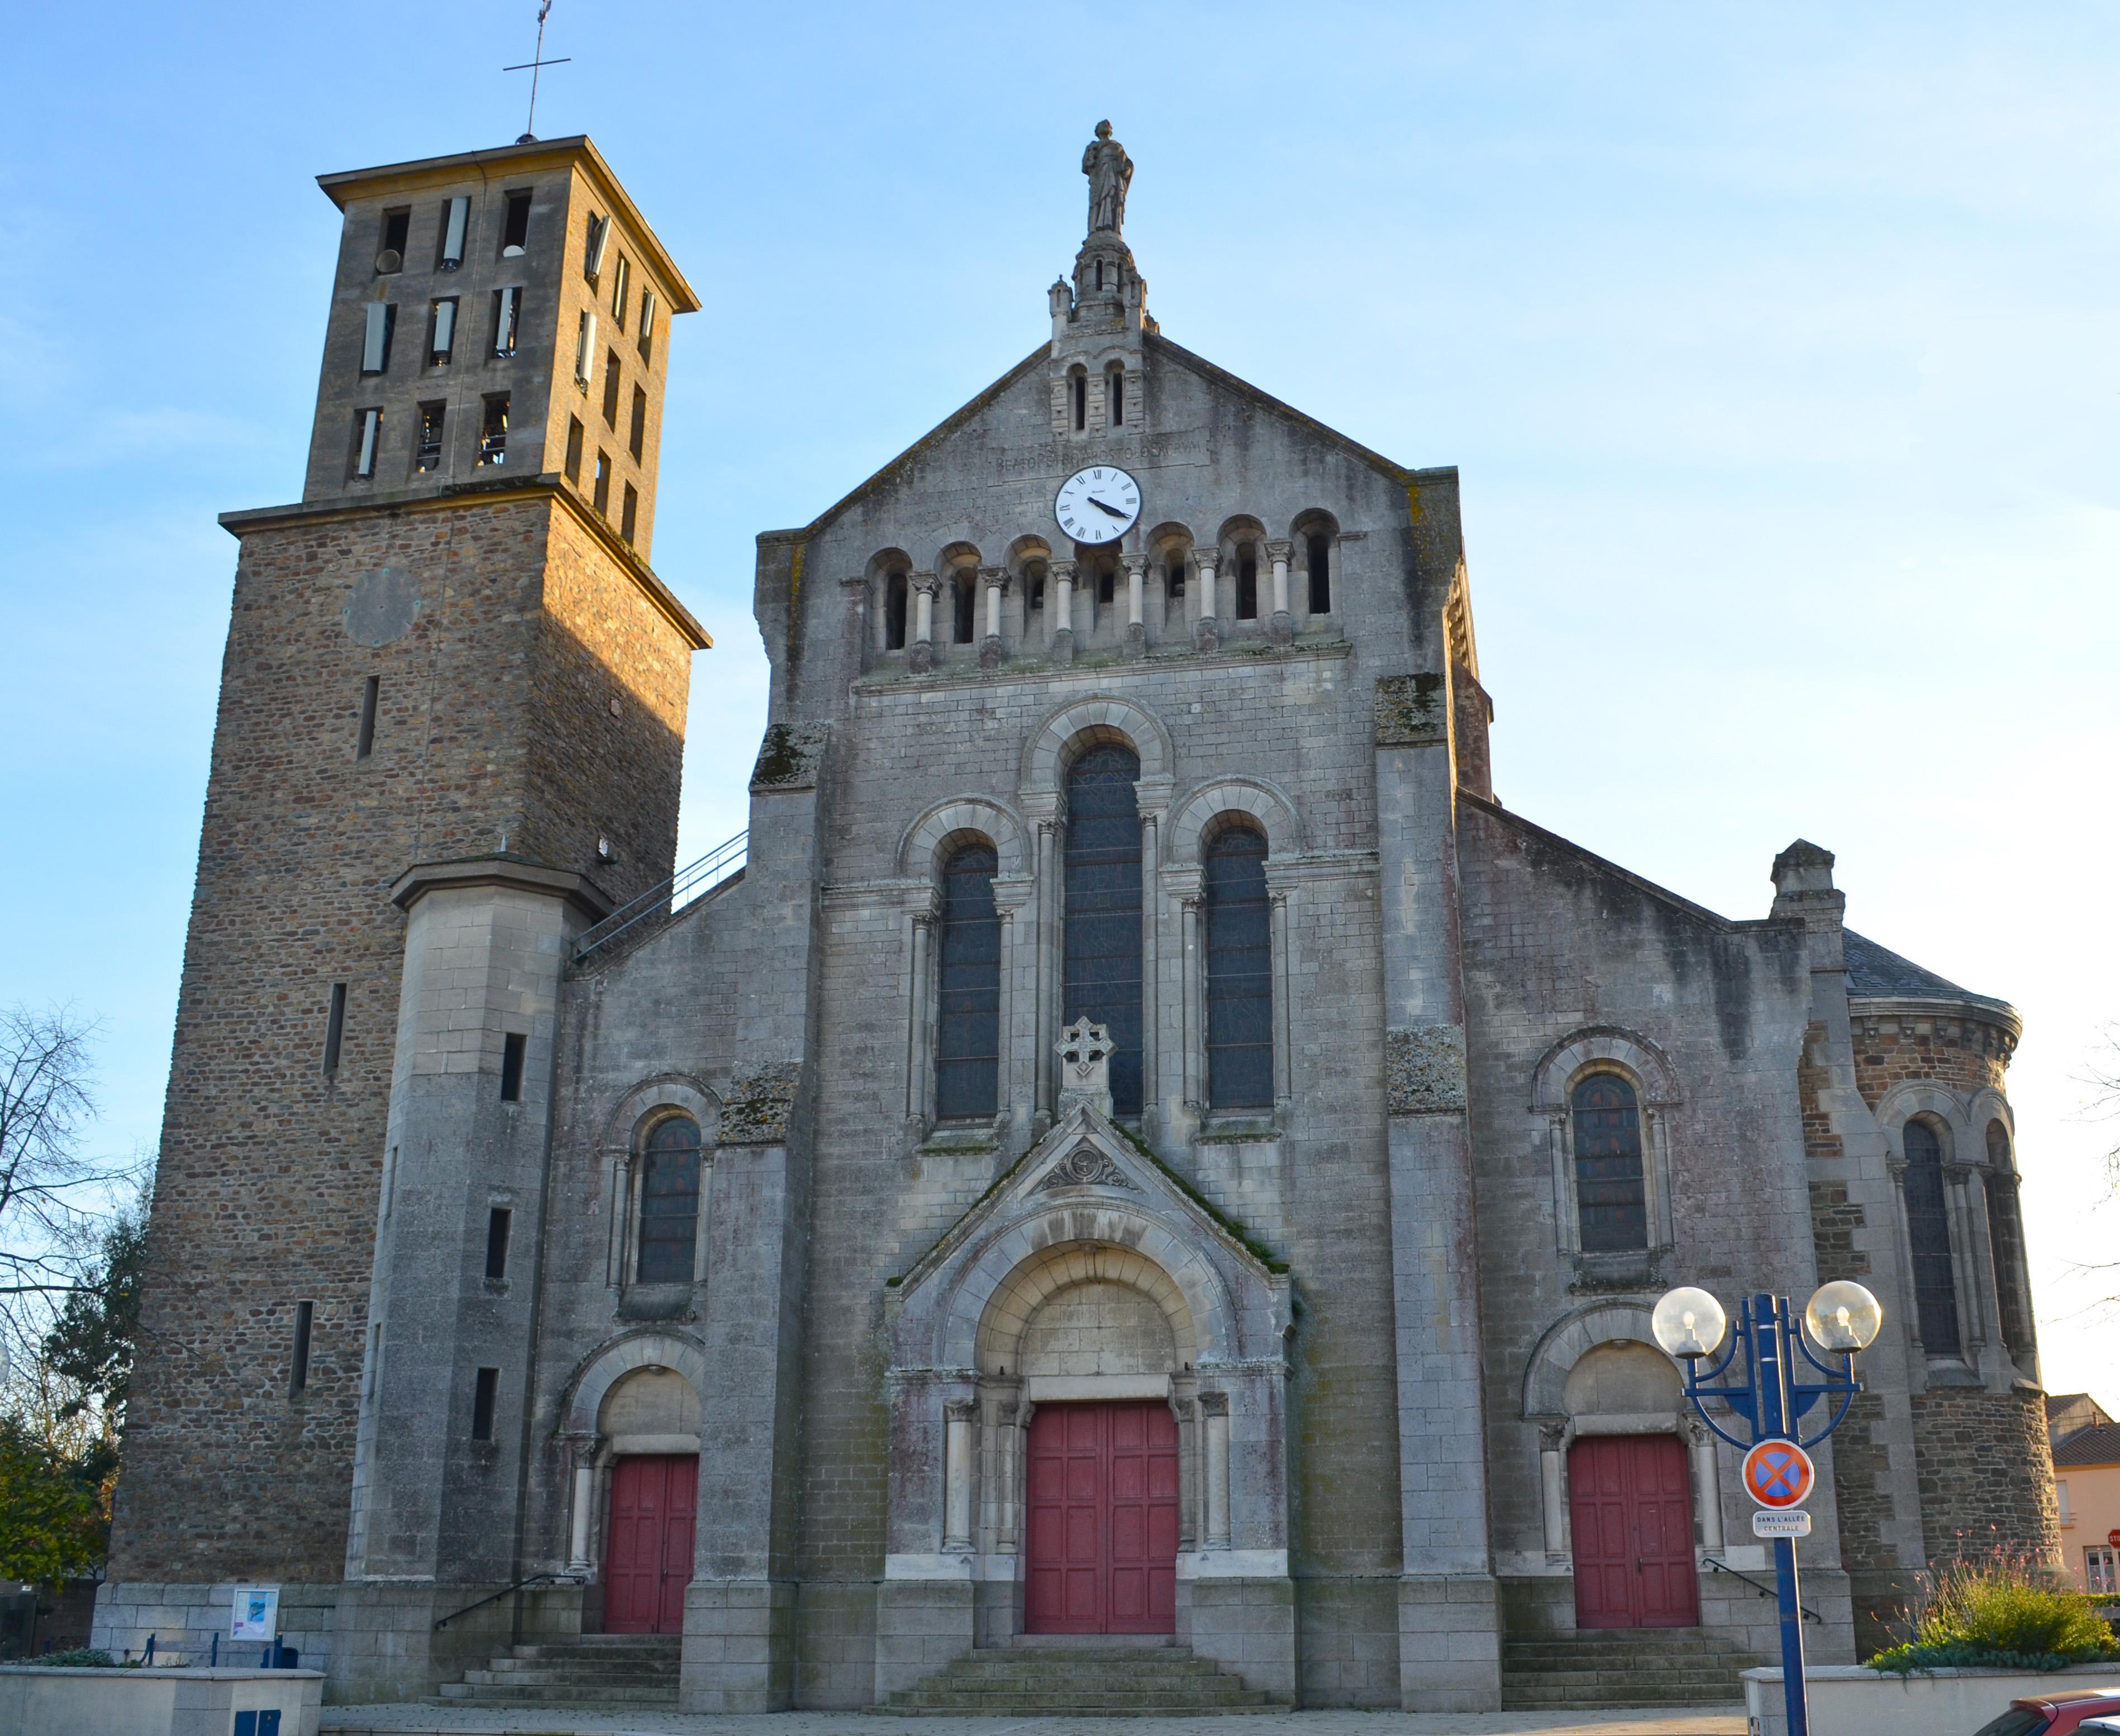 File:Bouguenais - Eglise Saint-Pierre (1).jpg - Wikimedia Commons